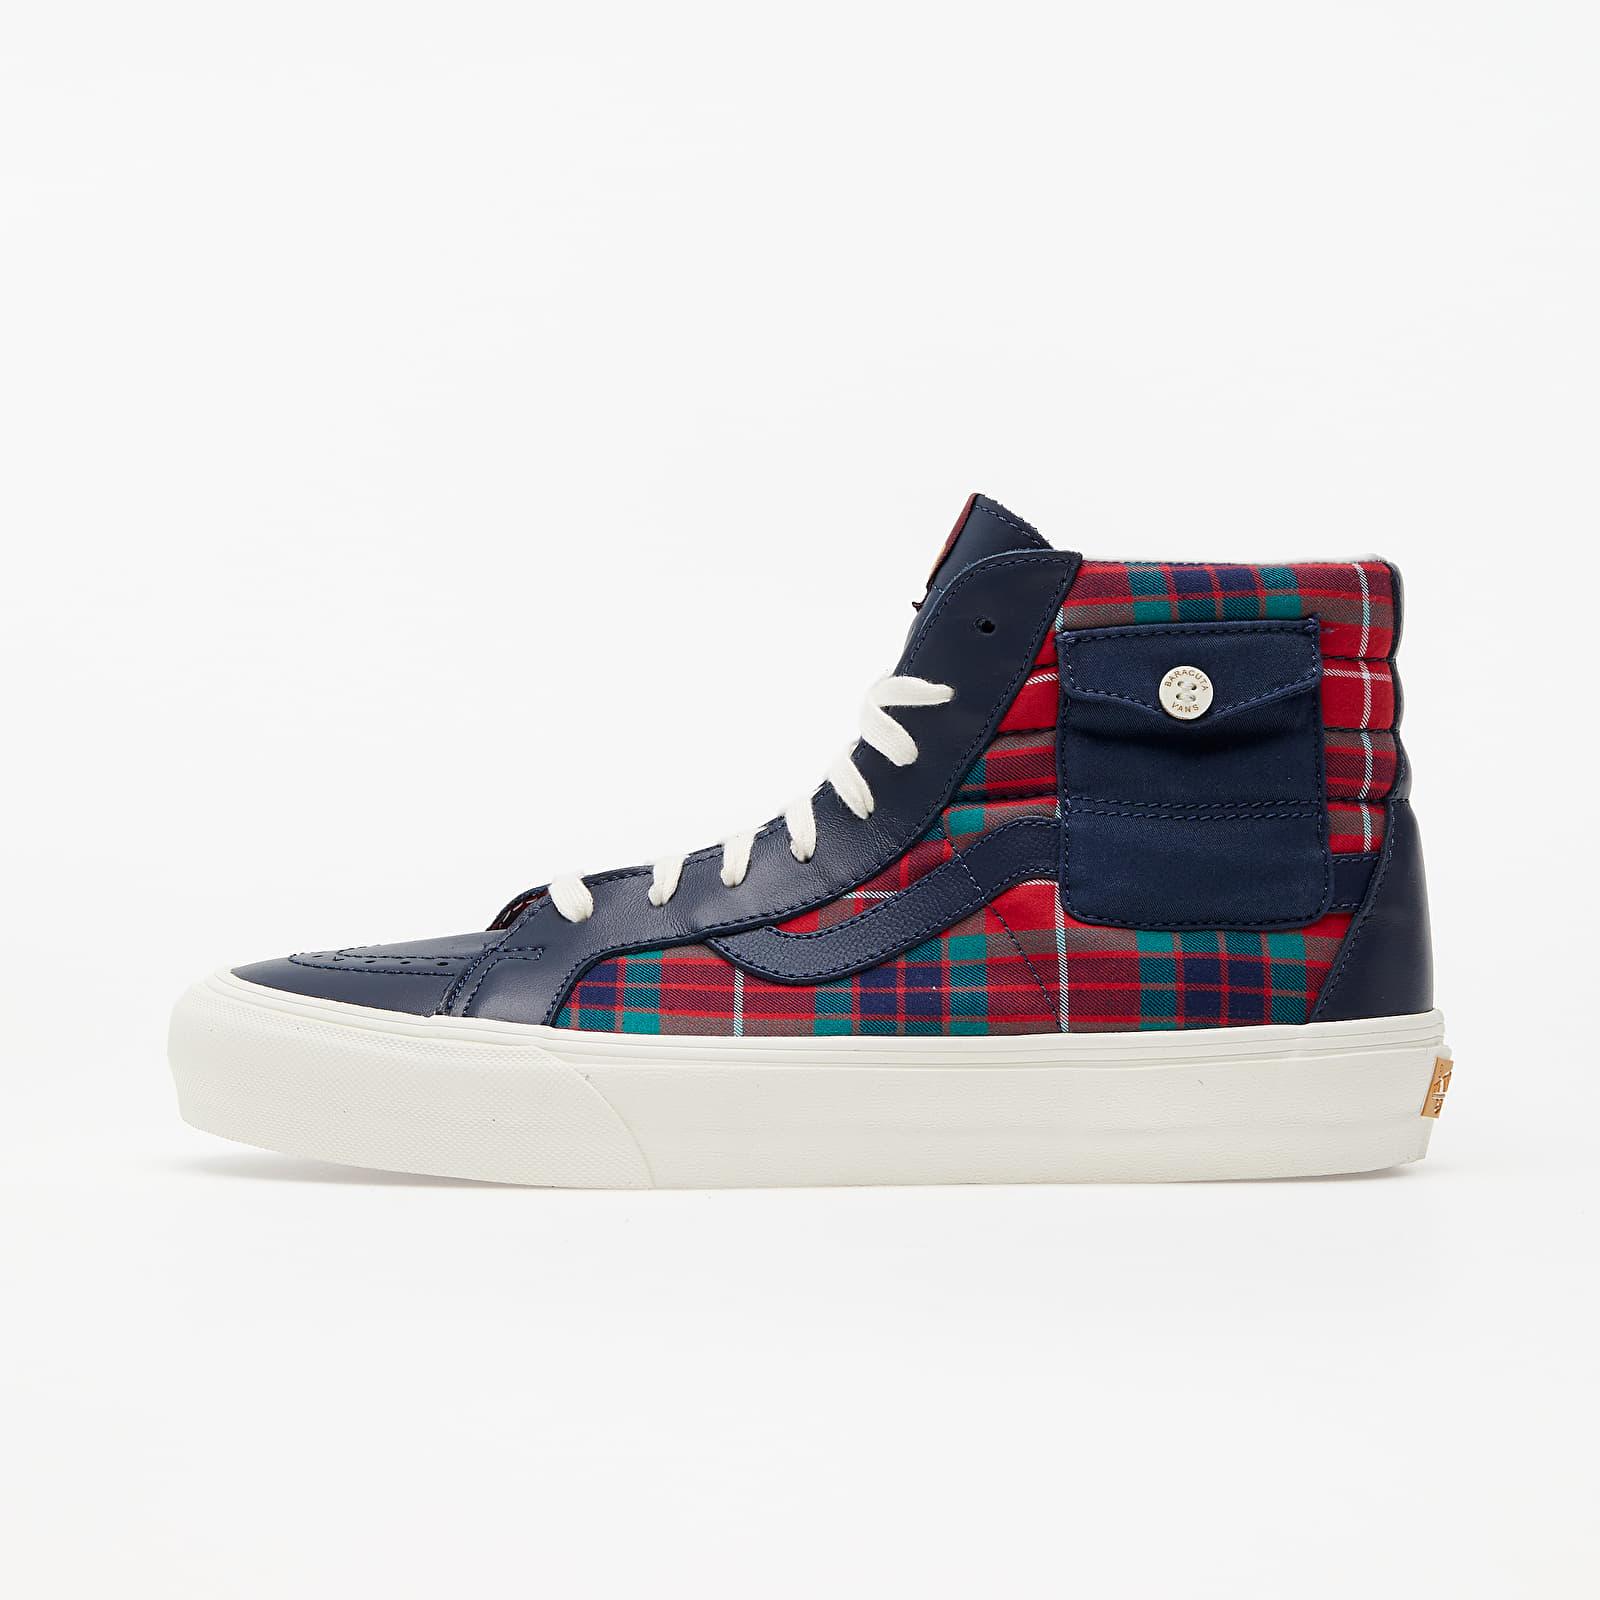 Încălțăminte și sneakerși pentru bărbați Vans x Baracuta Sk8-Hi Pocket VLT LX Dress Blues/ Tartan Plaid/ Marshmallow